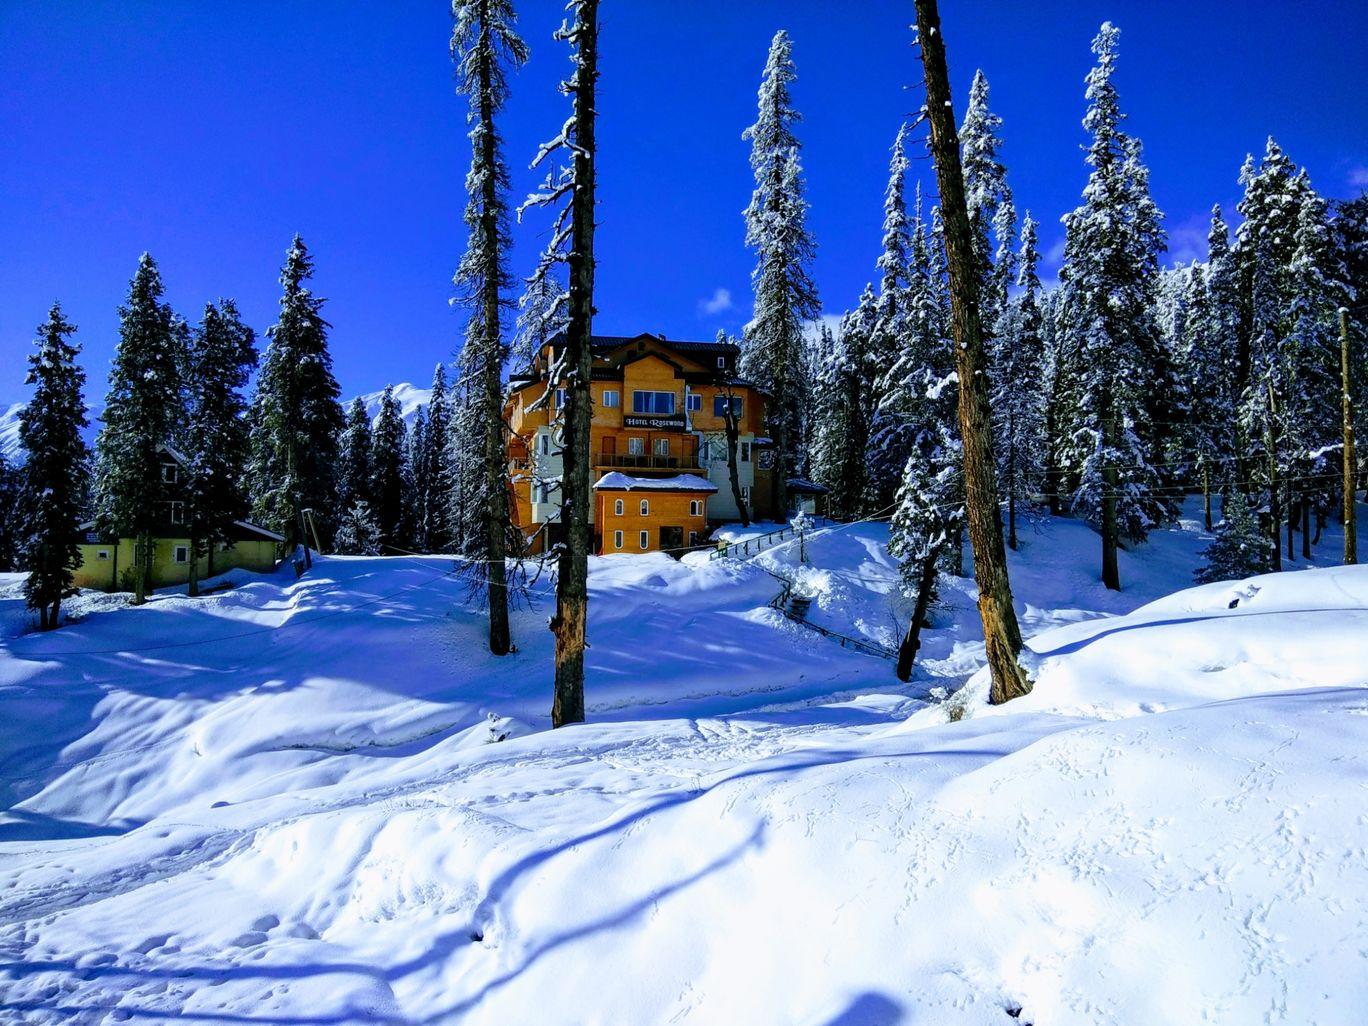 Photo of Kashmir Valley By Anupriya